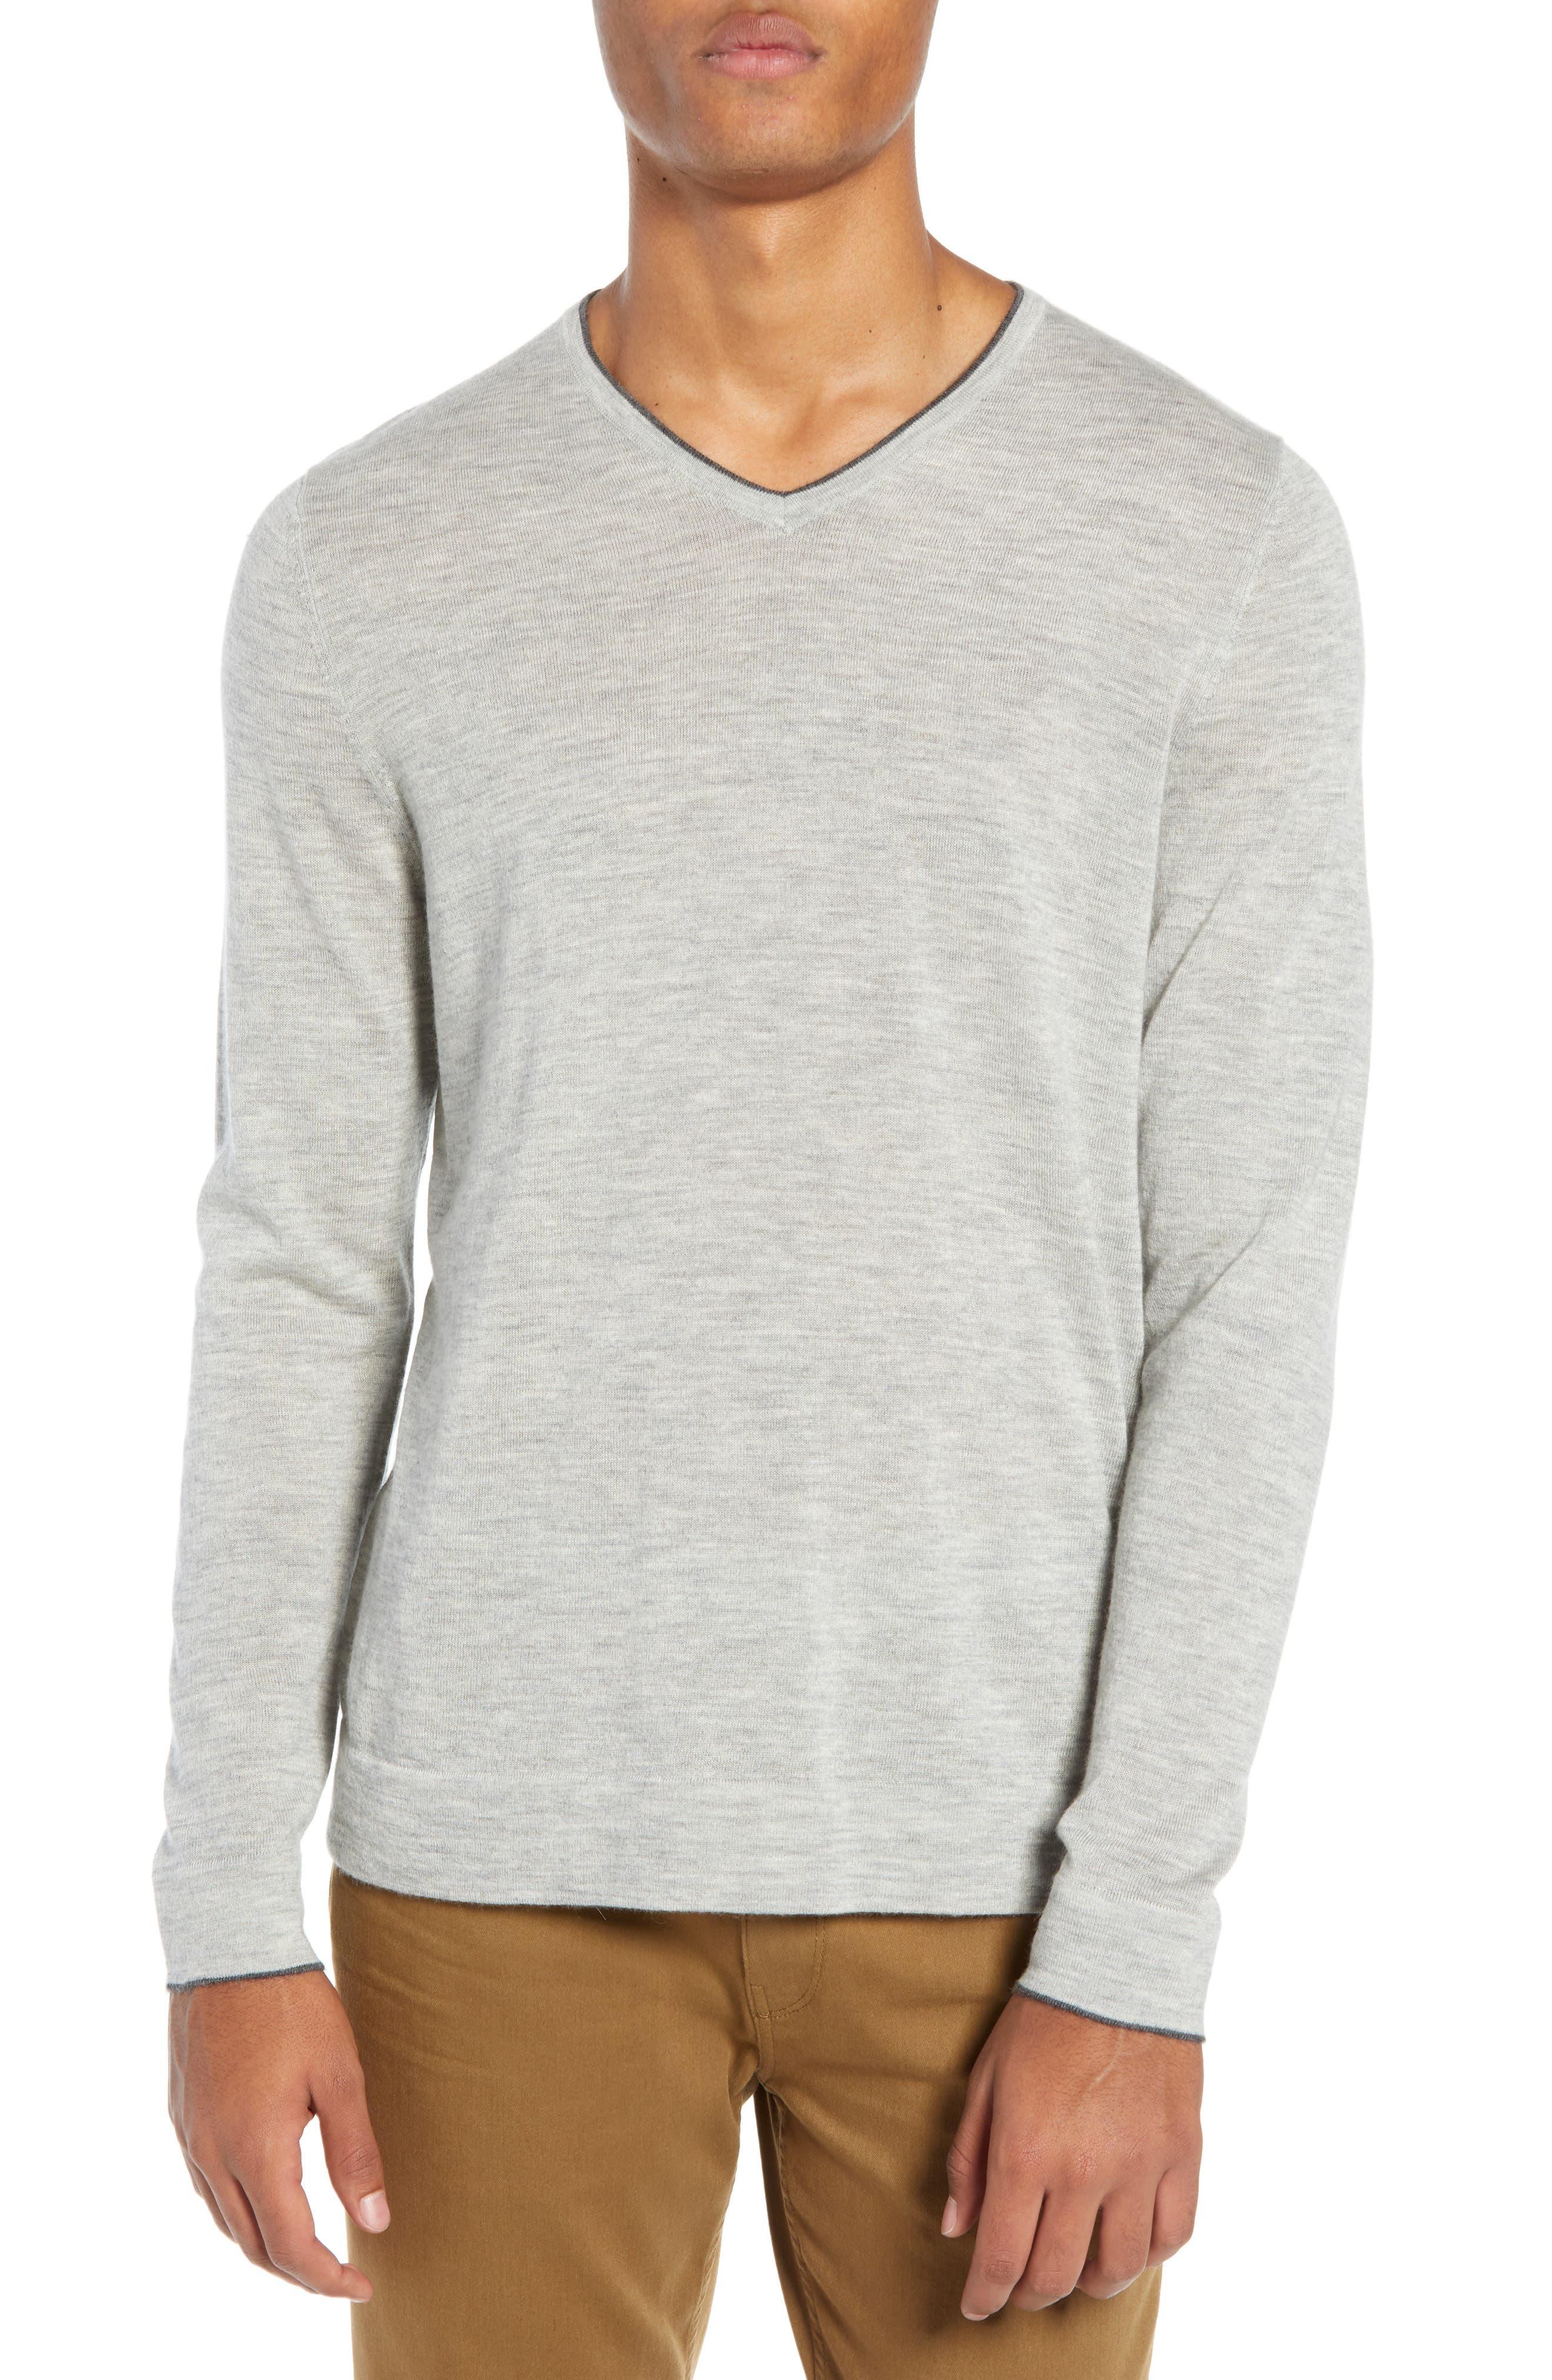 NORDSTROM SIGNATURE,                             Cashmere V-Neck Sweater,                             Main thumbnail 1, color,                             050